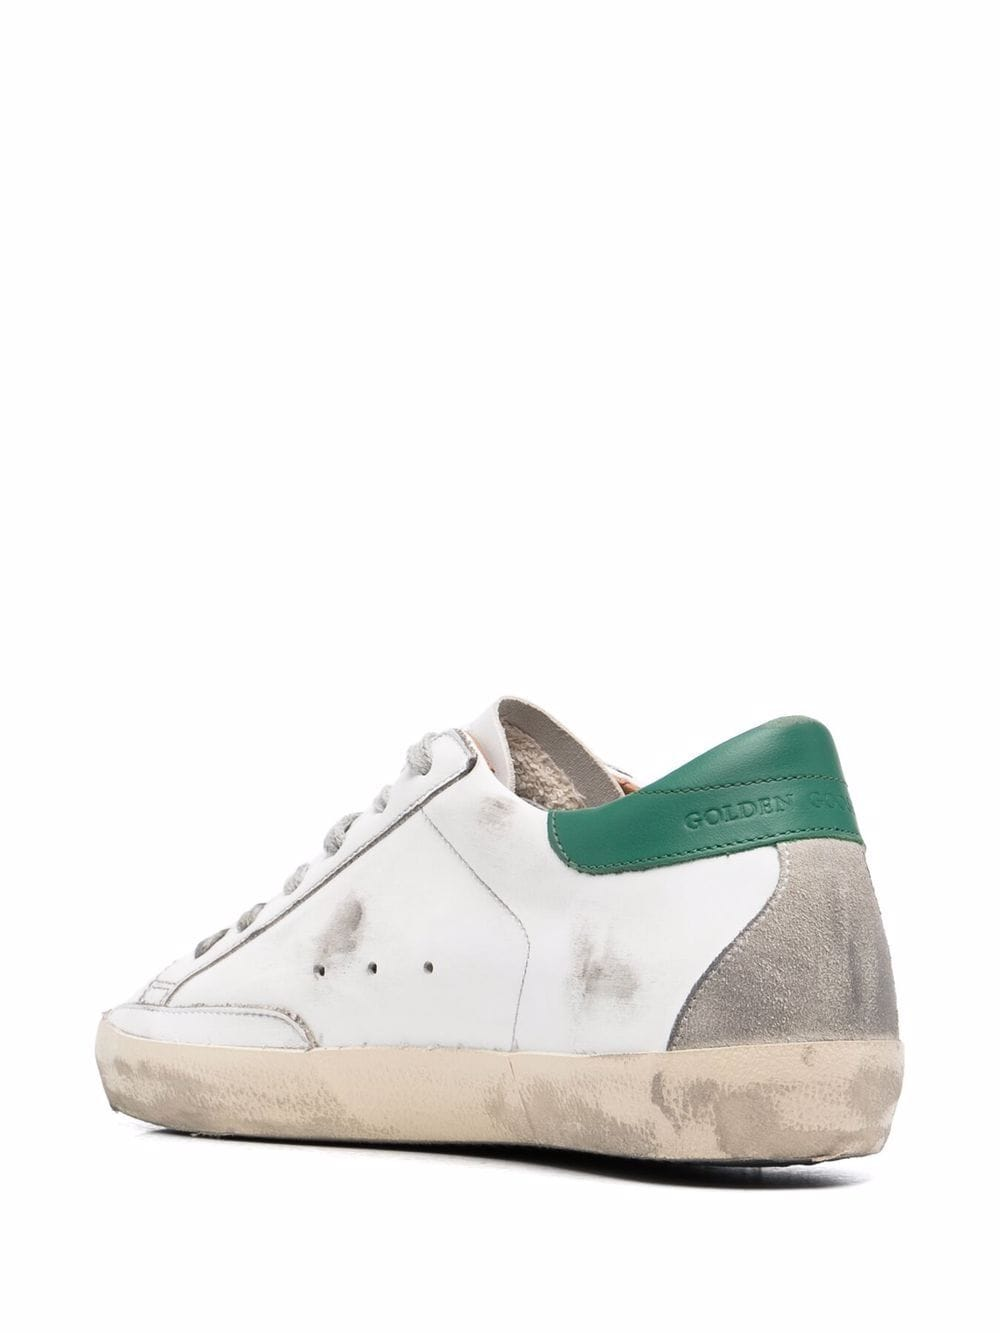 Picture of Golden Goose Deluxe Brand   Superstar Low-Top Distressed Sneakers